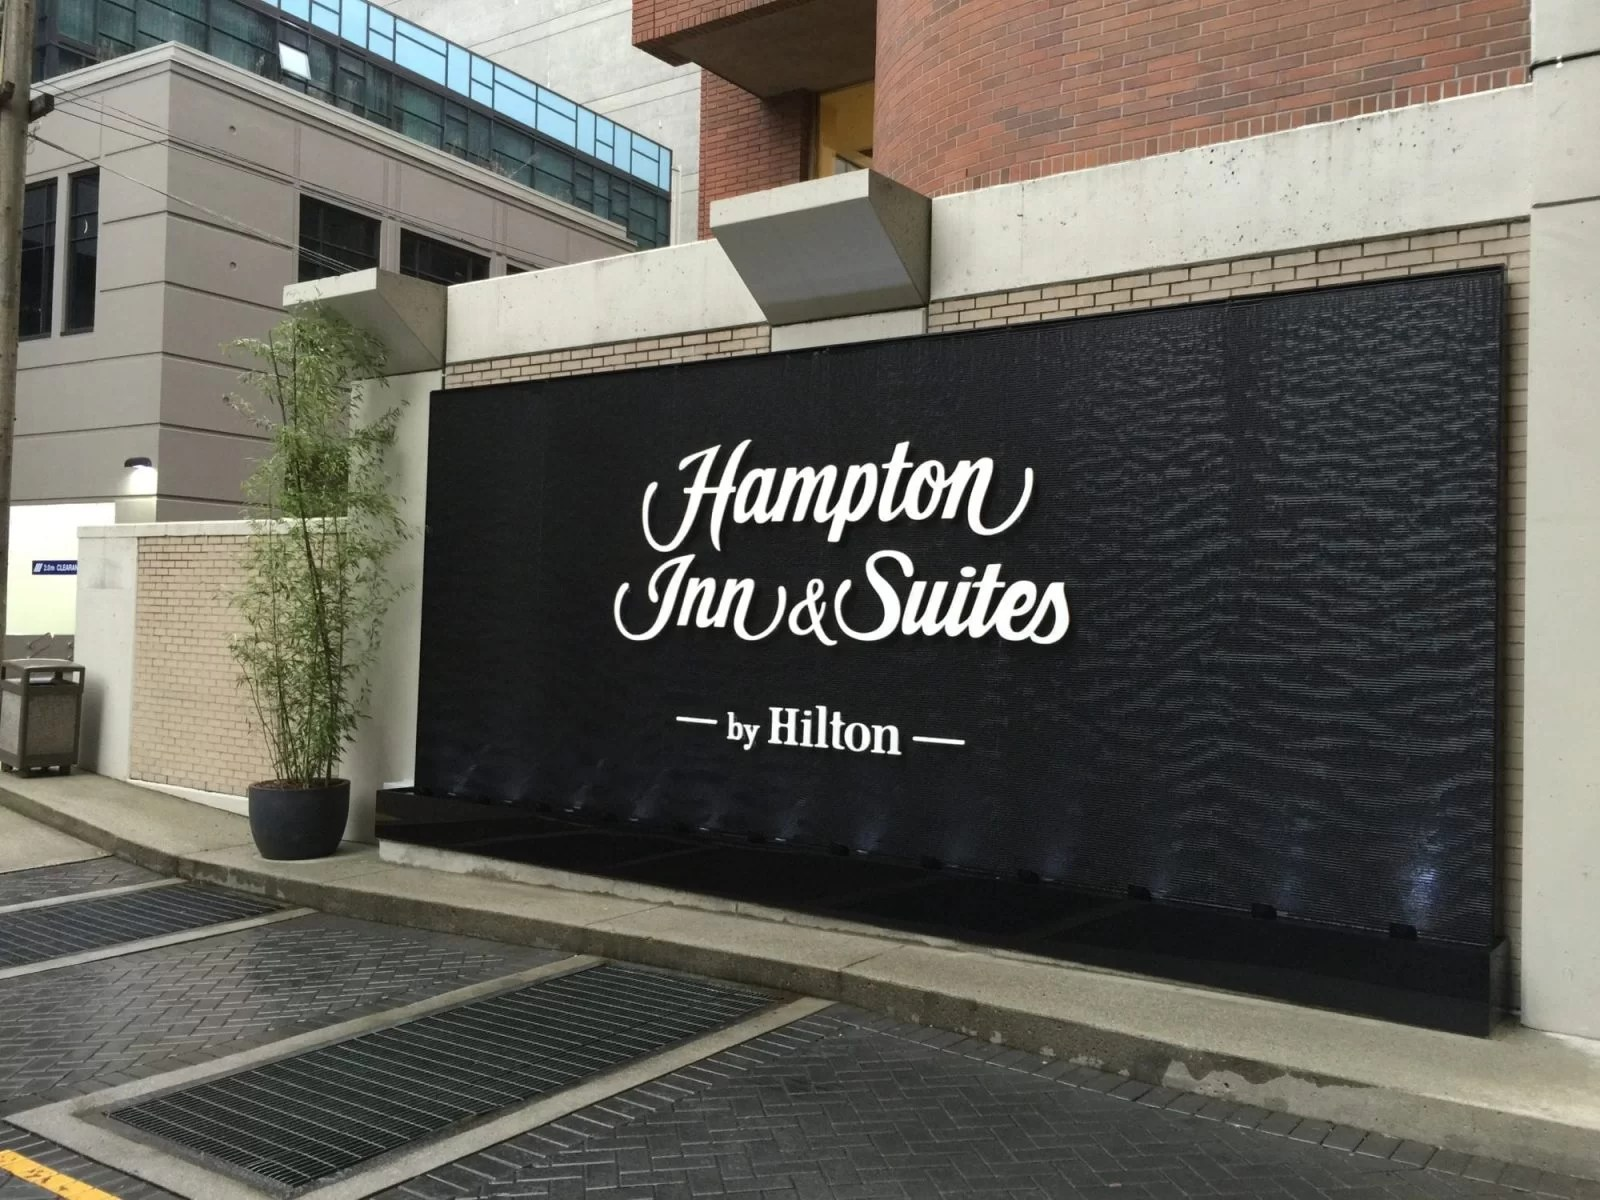 Black Scored Acrylic Water Wall Aquafall with Logo for Hampton Inn Vancouver Canada 2